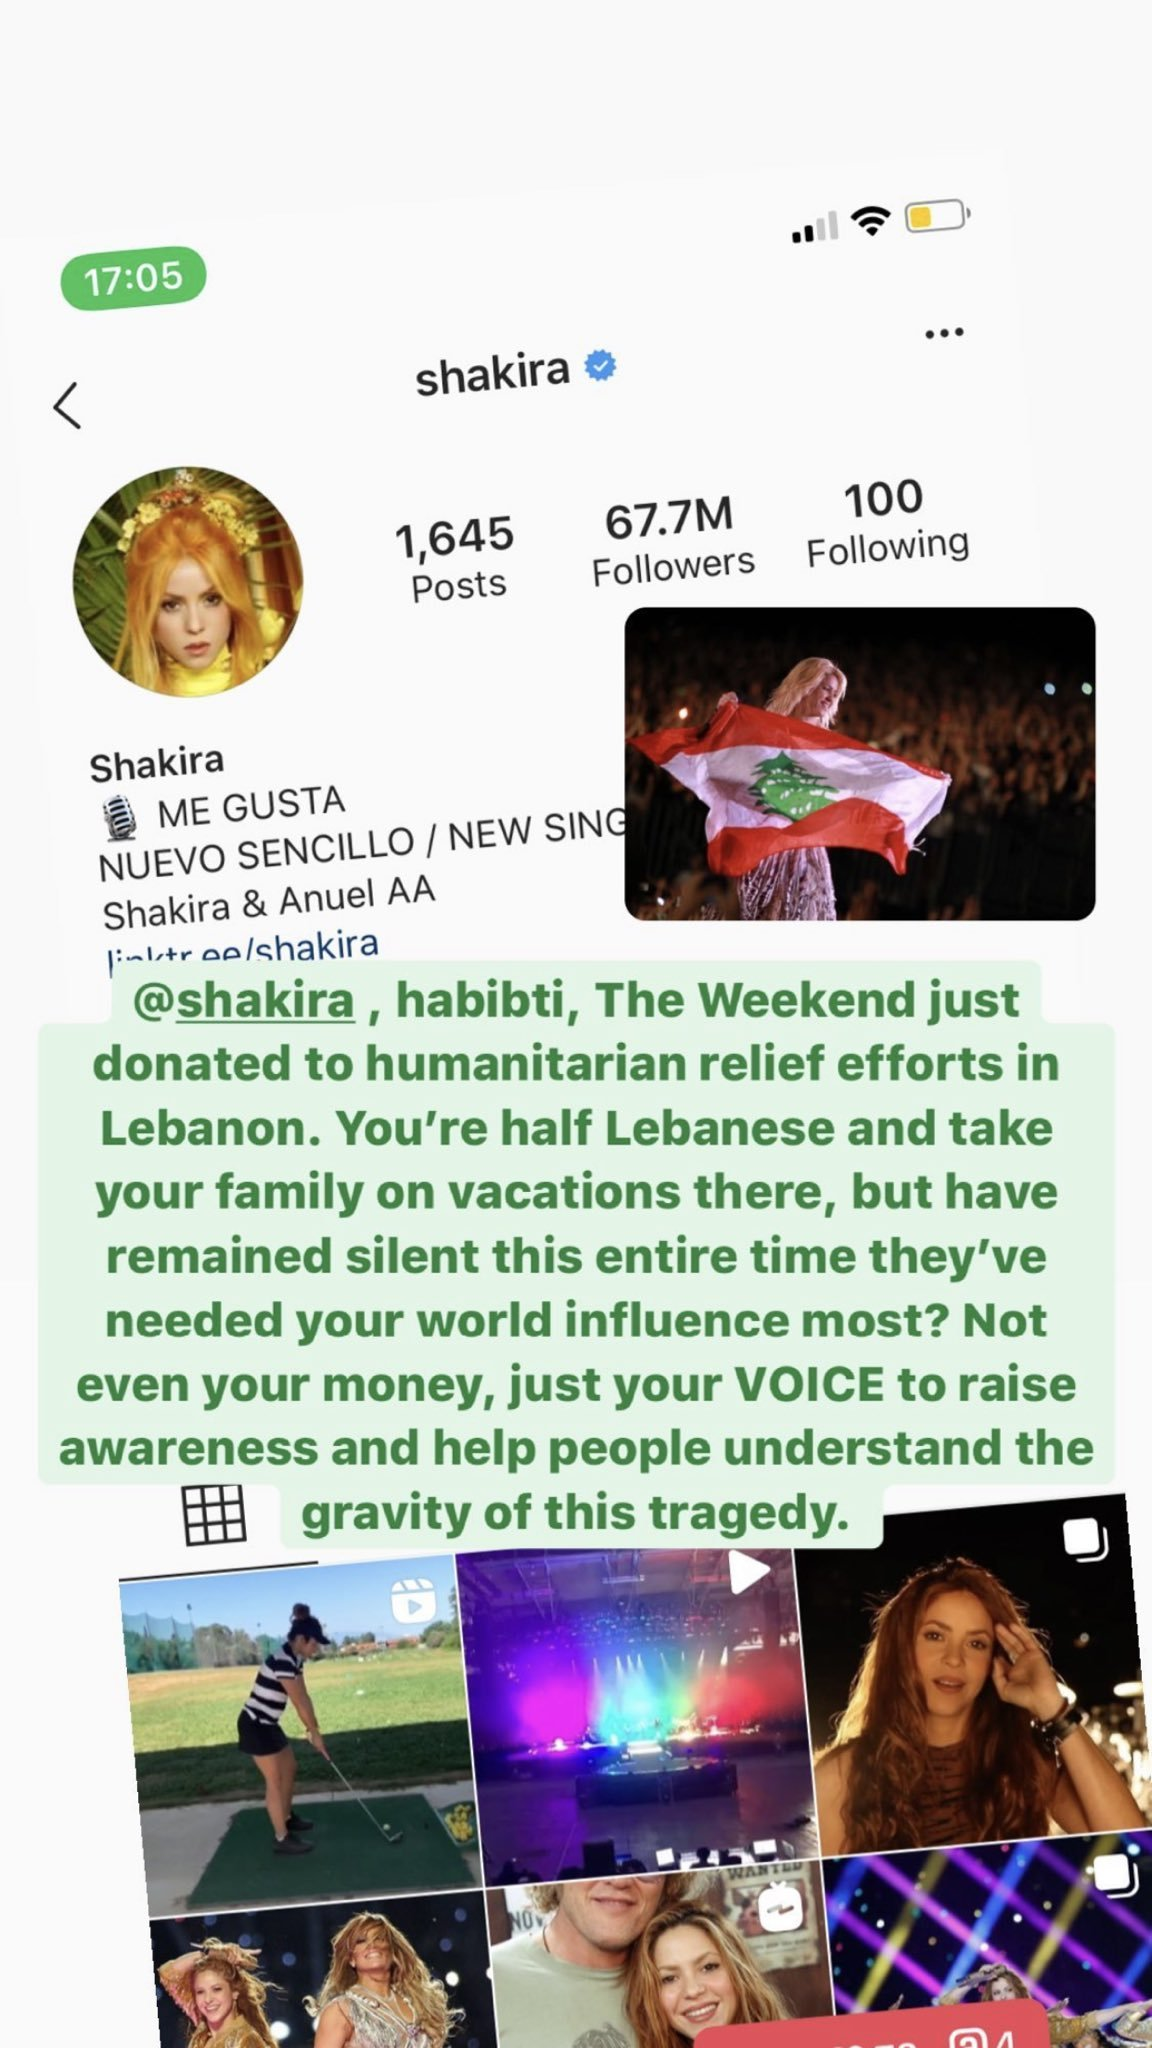 Eski porno yıldızı Mia Khalifa, Beyrut patlamasına sessiz kalan Shakira'ya isyan etti